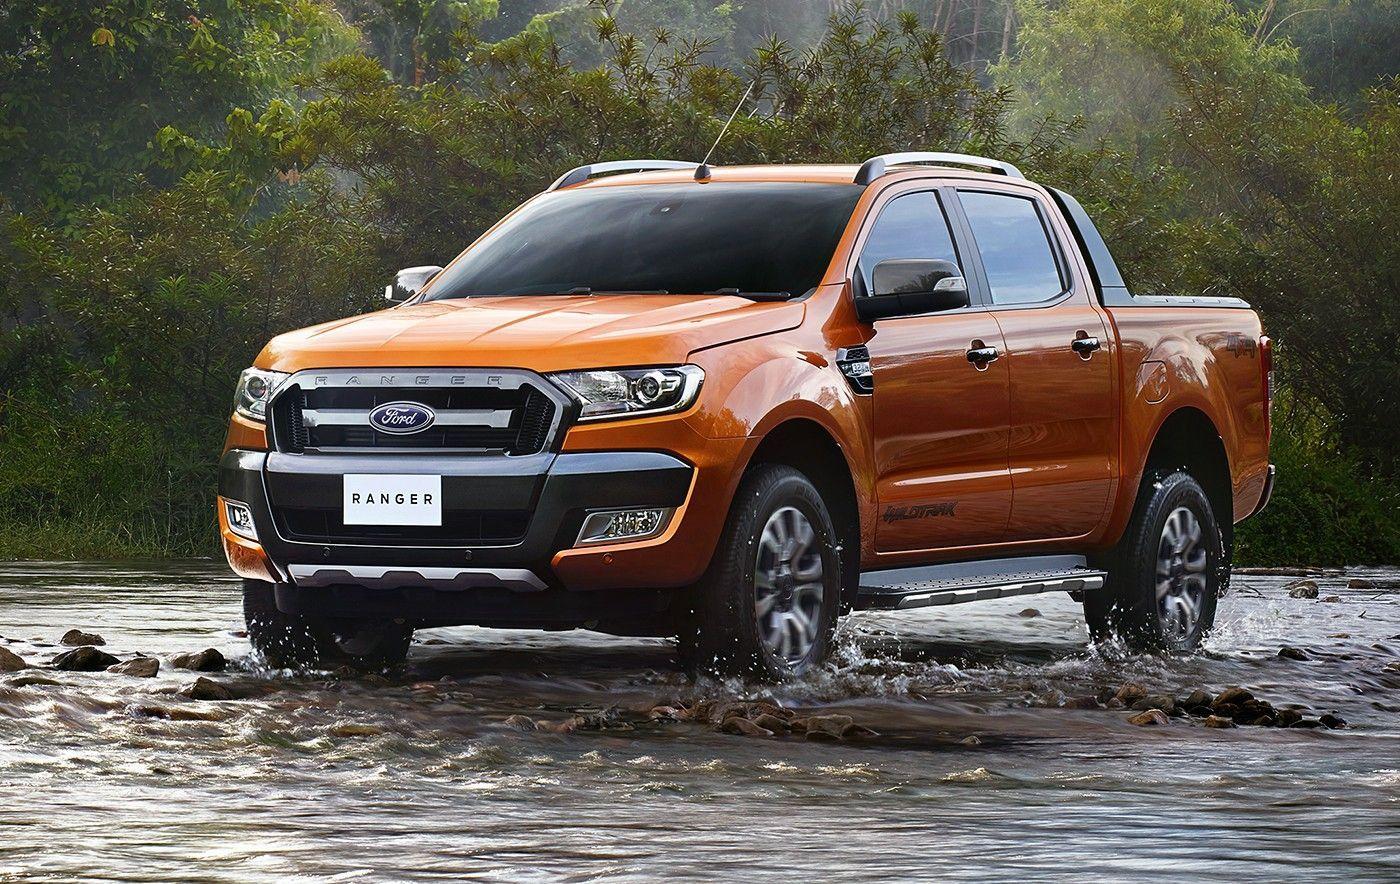 2020 Ford Ranger Price First Drive En 2020 Ford Ranger Wildtrak Ford Ranger Camioneta Ford Ranger